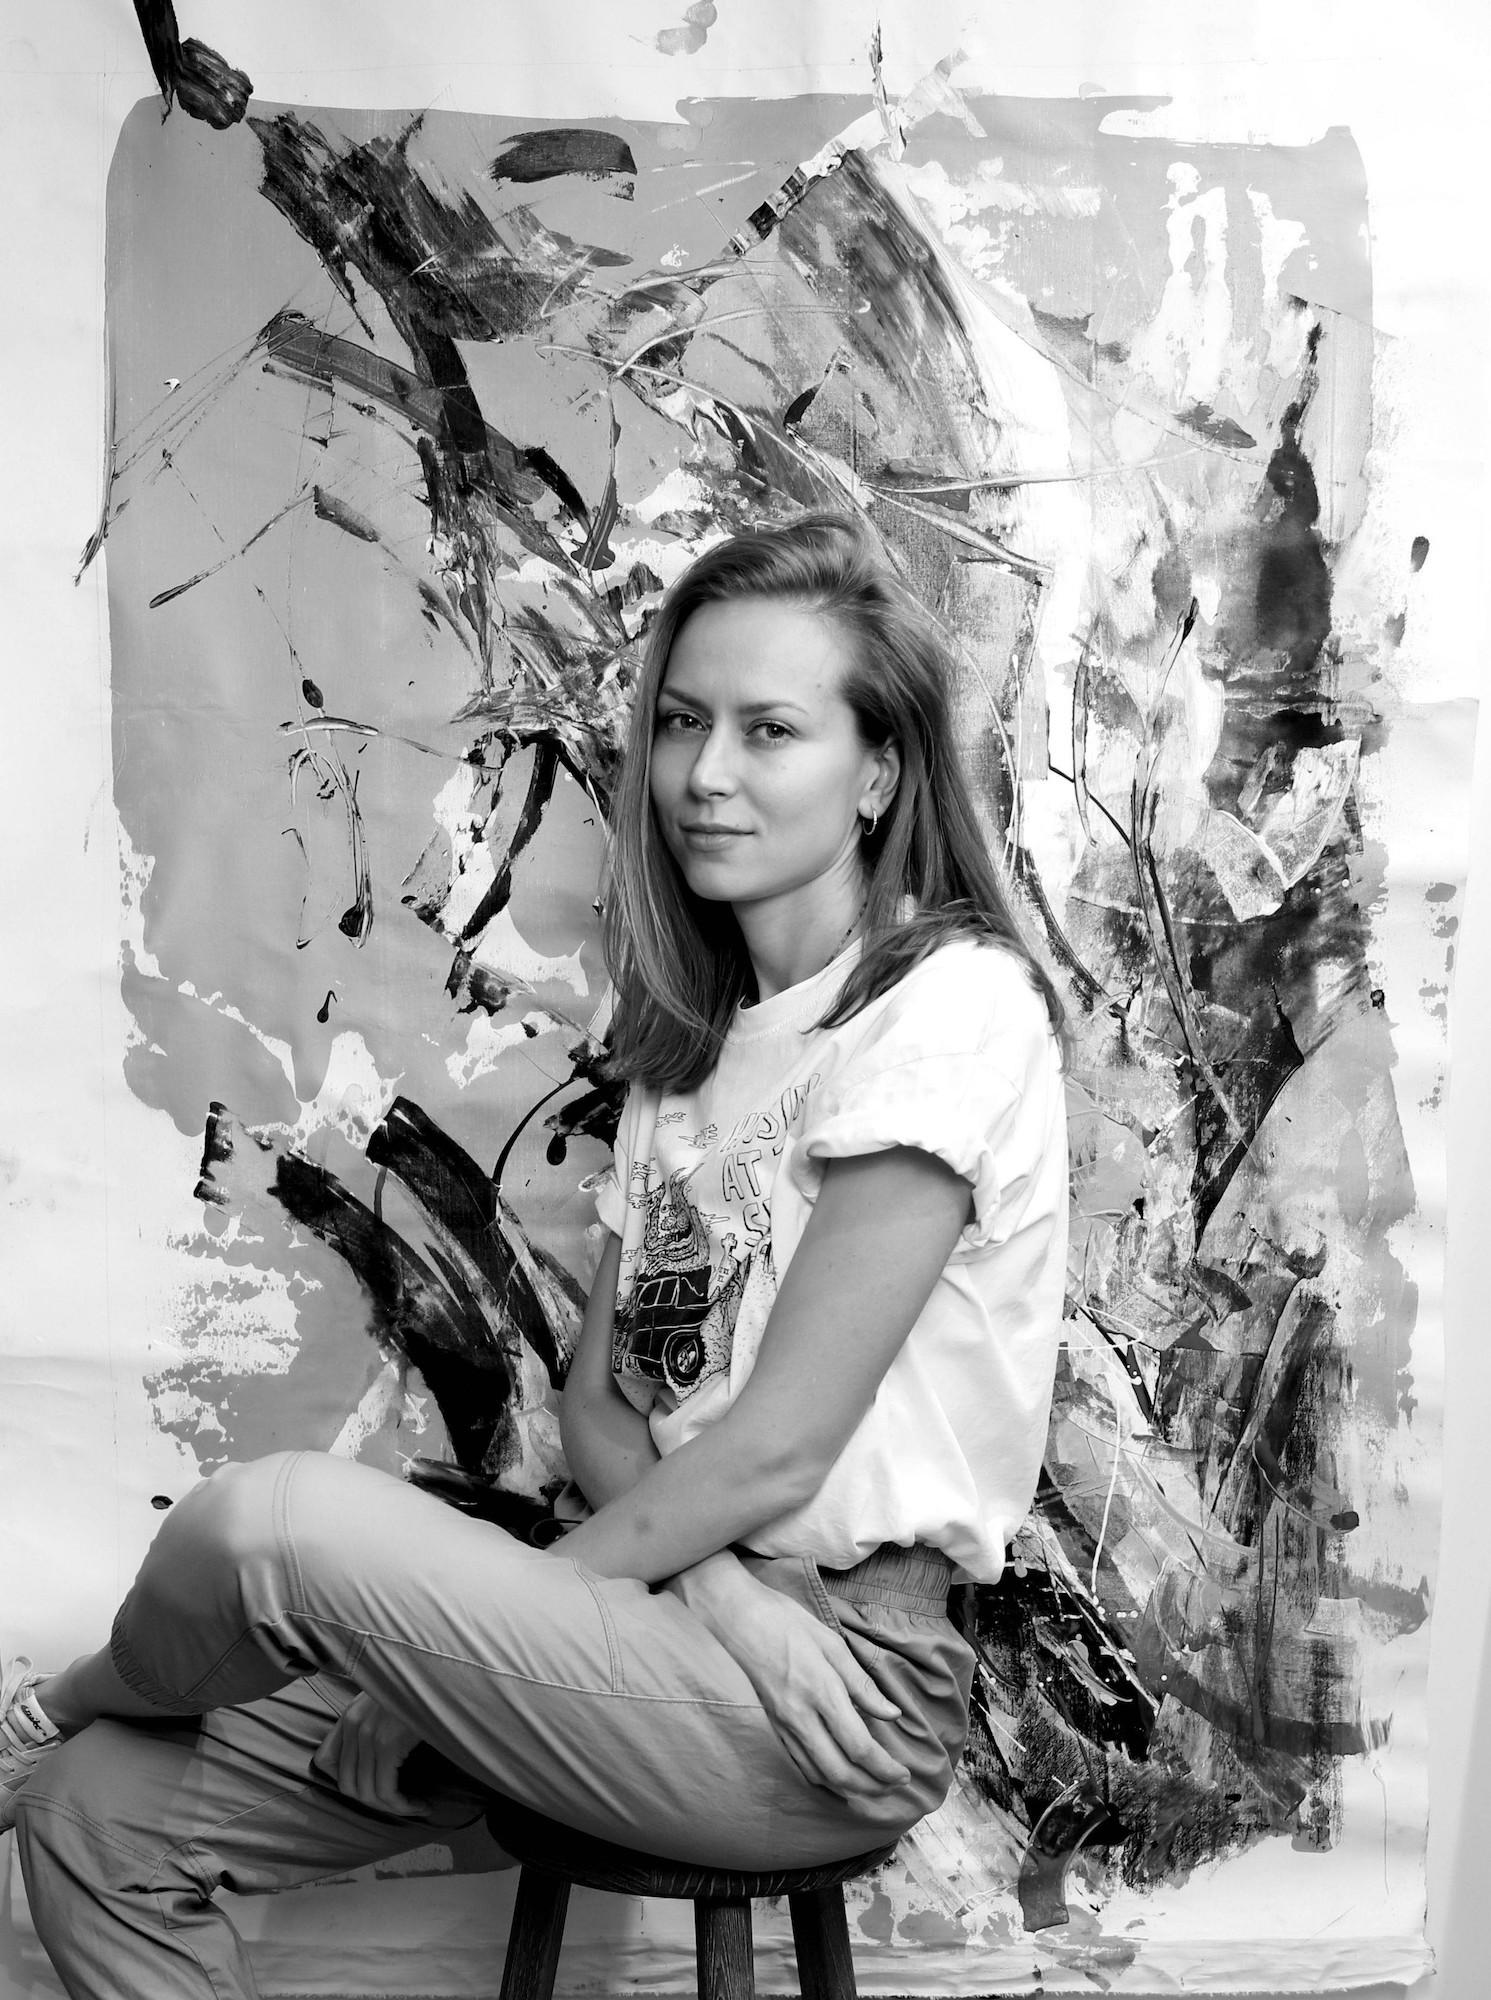 Evgenia Makarova